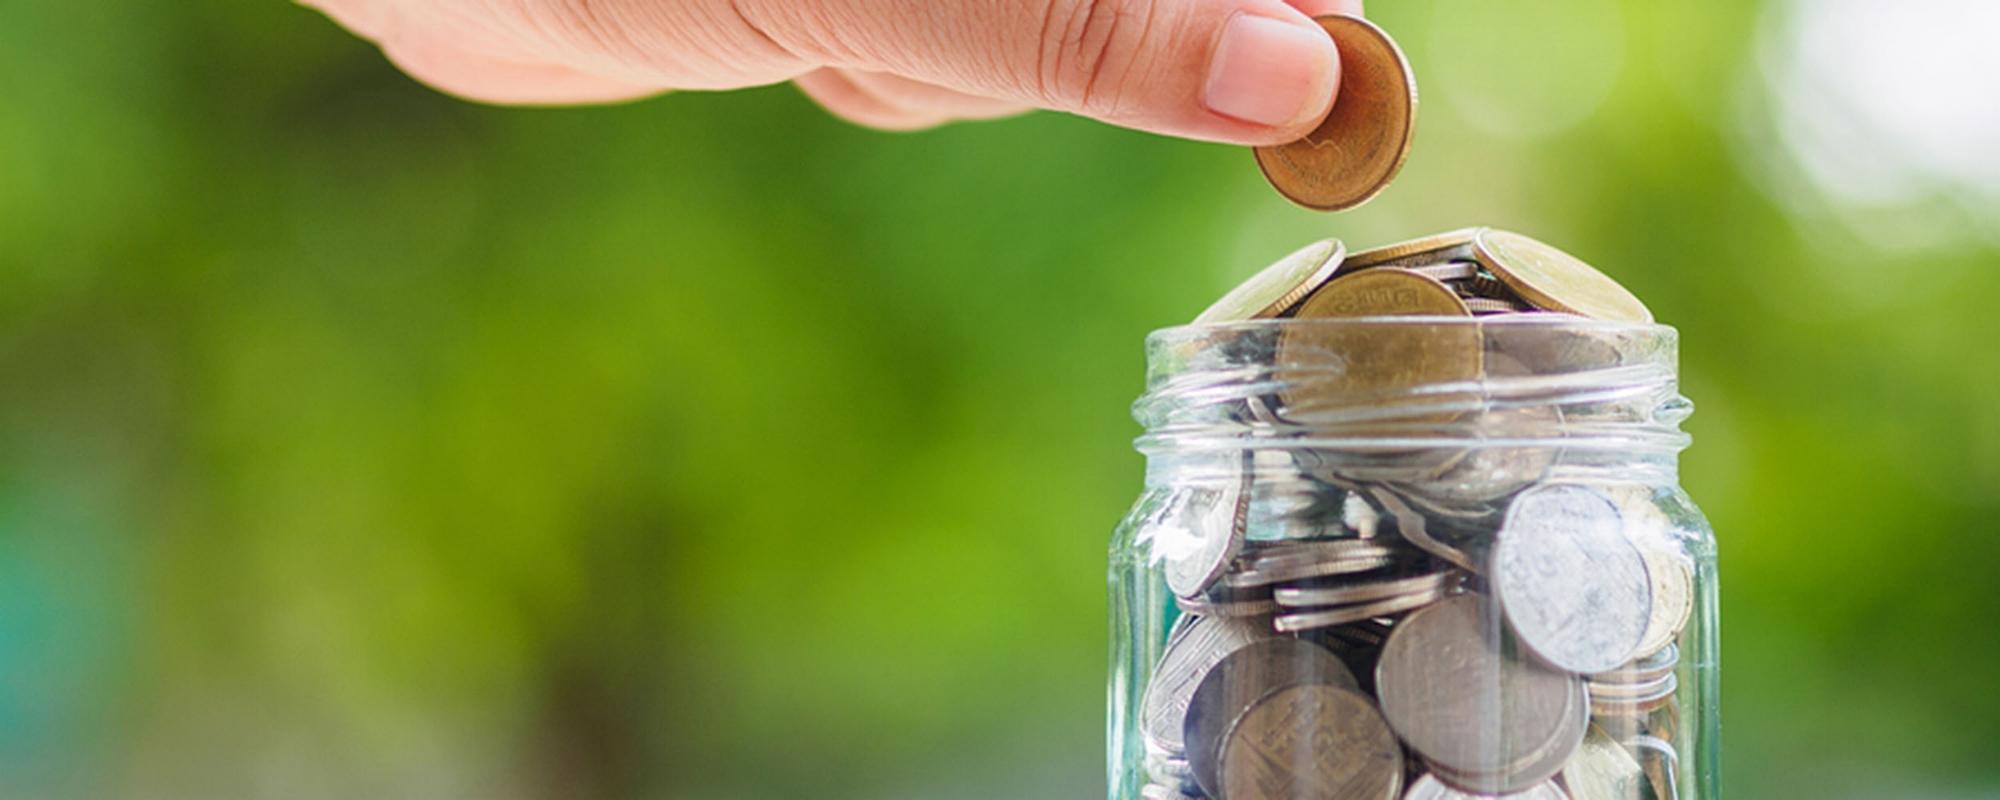 Skill 9:  Personal Finance